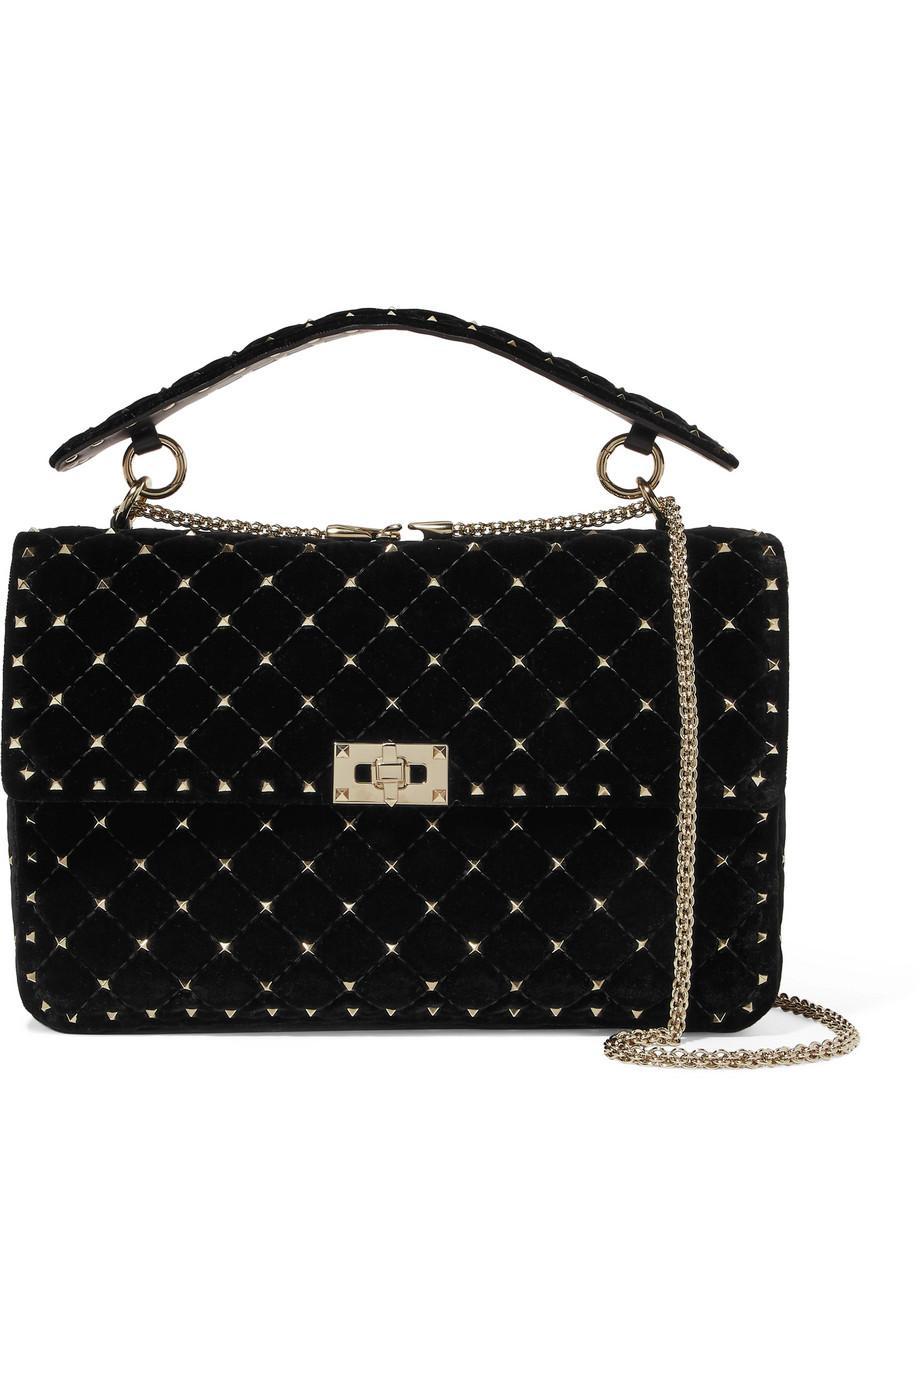 Valentino Rockstud Velvet Spike Medium Shoulder Bag 68GZ7vc